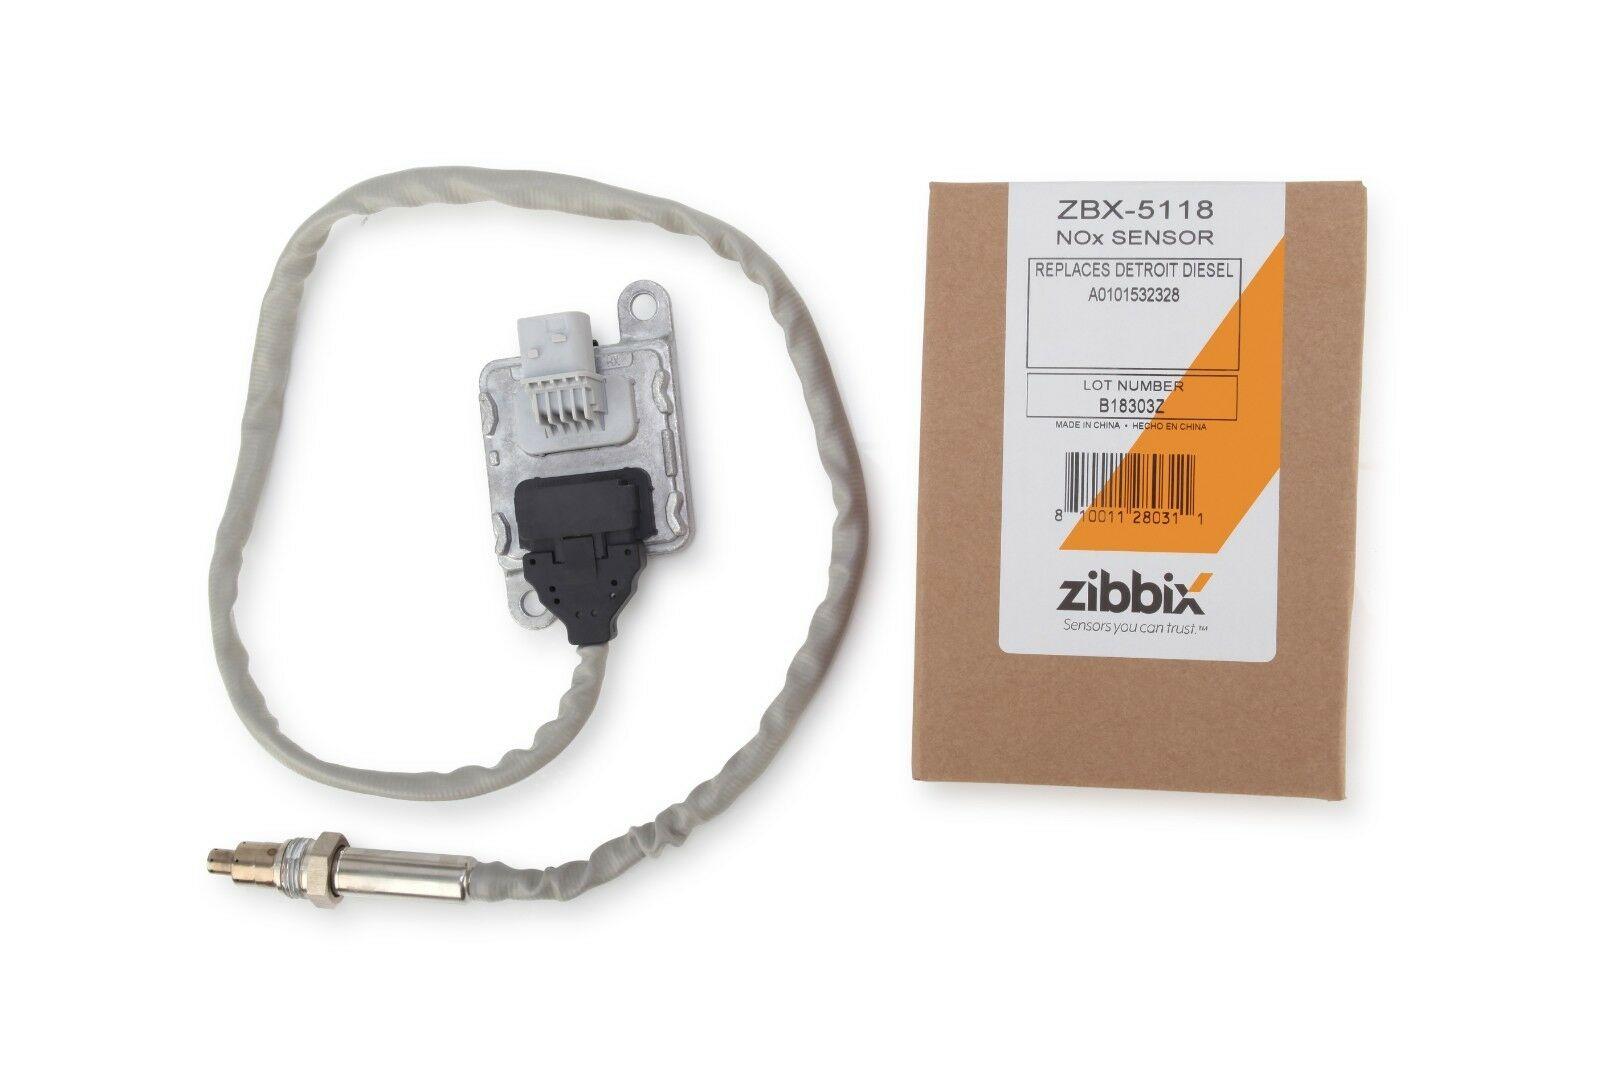 Zibbix NOx Nitrogen Oxide Sensor Outlet For DD13 DD15 DD16 Detroit Diesel